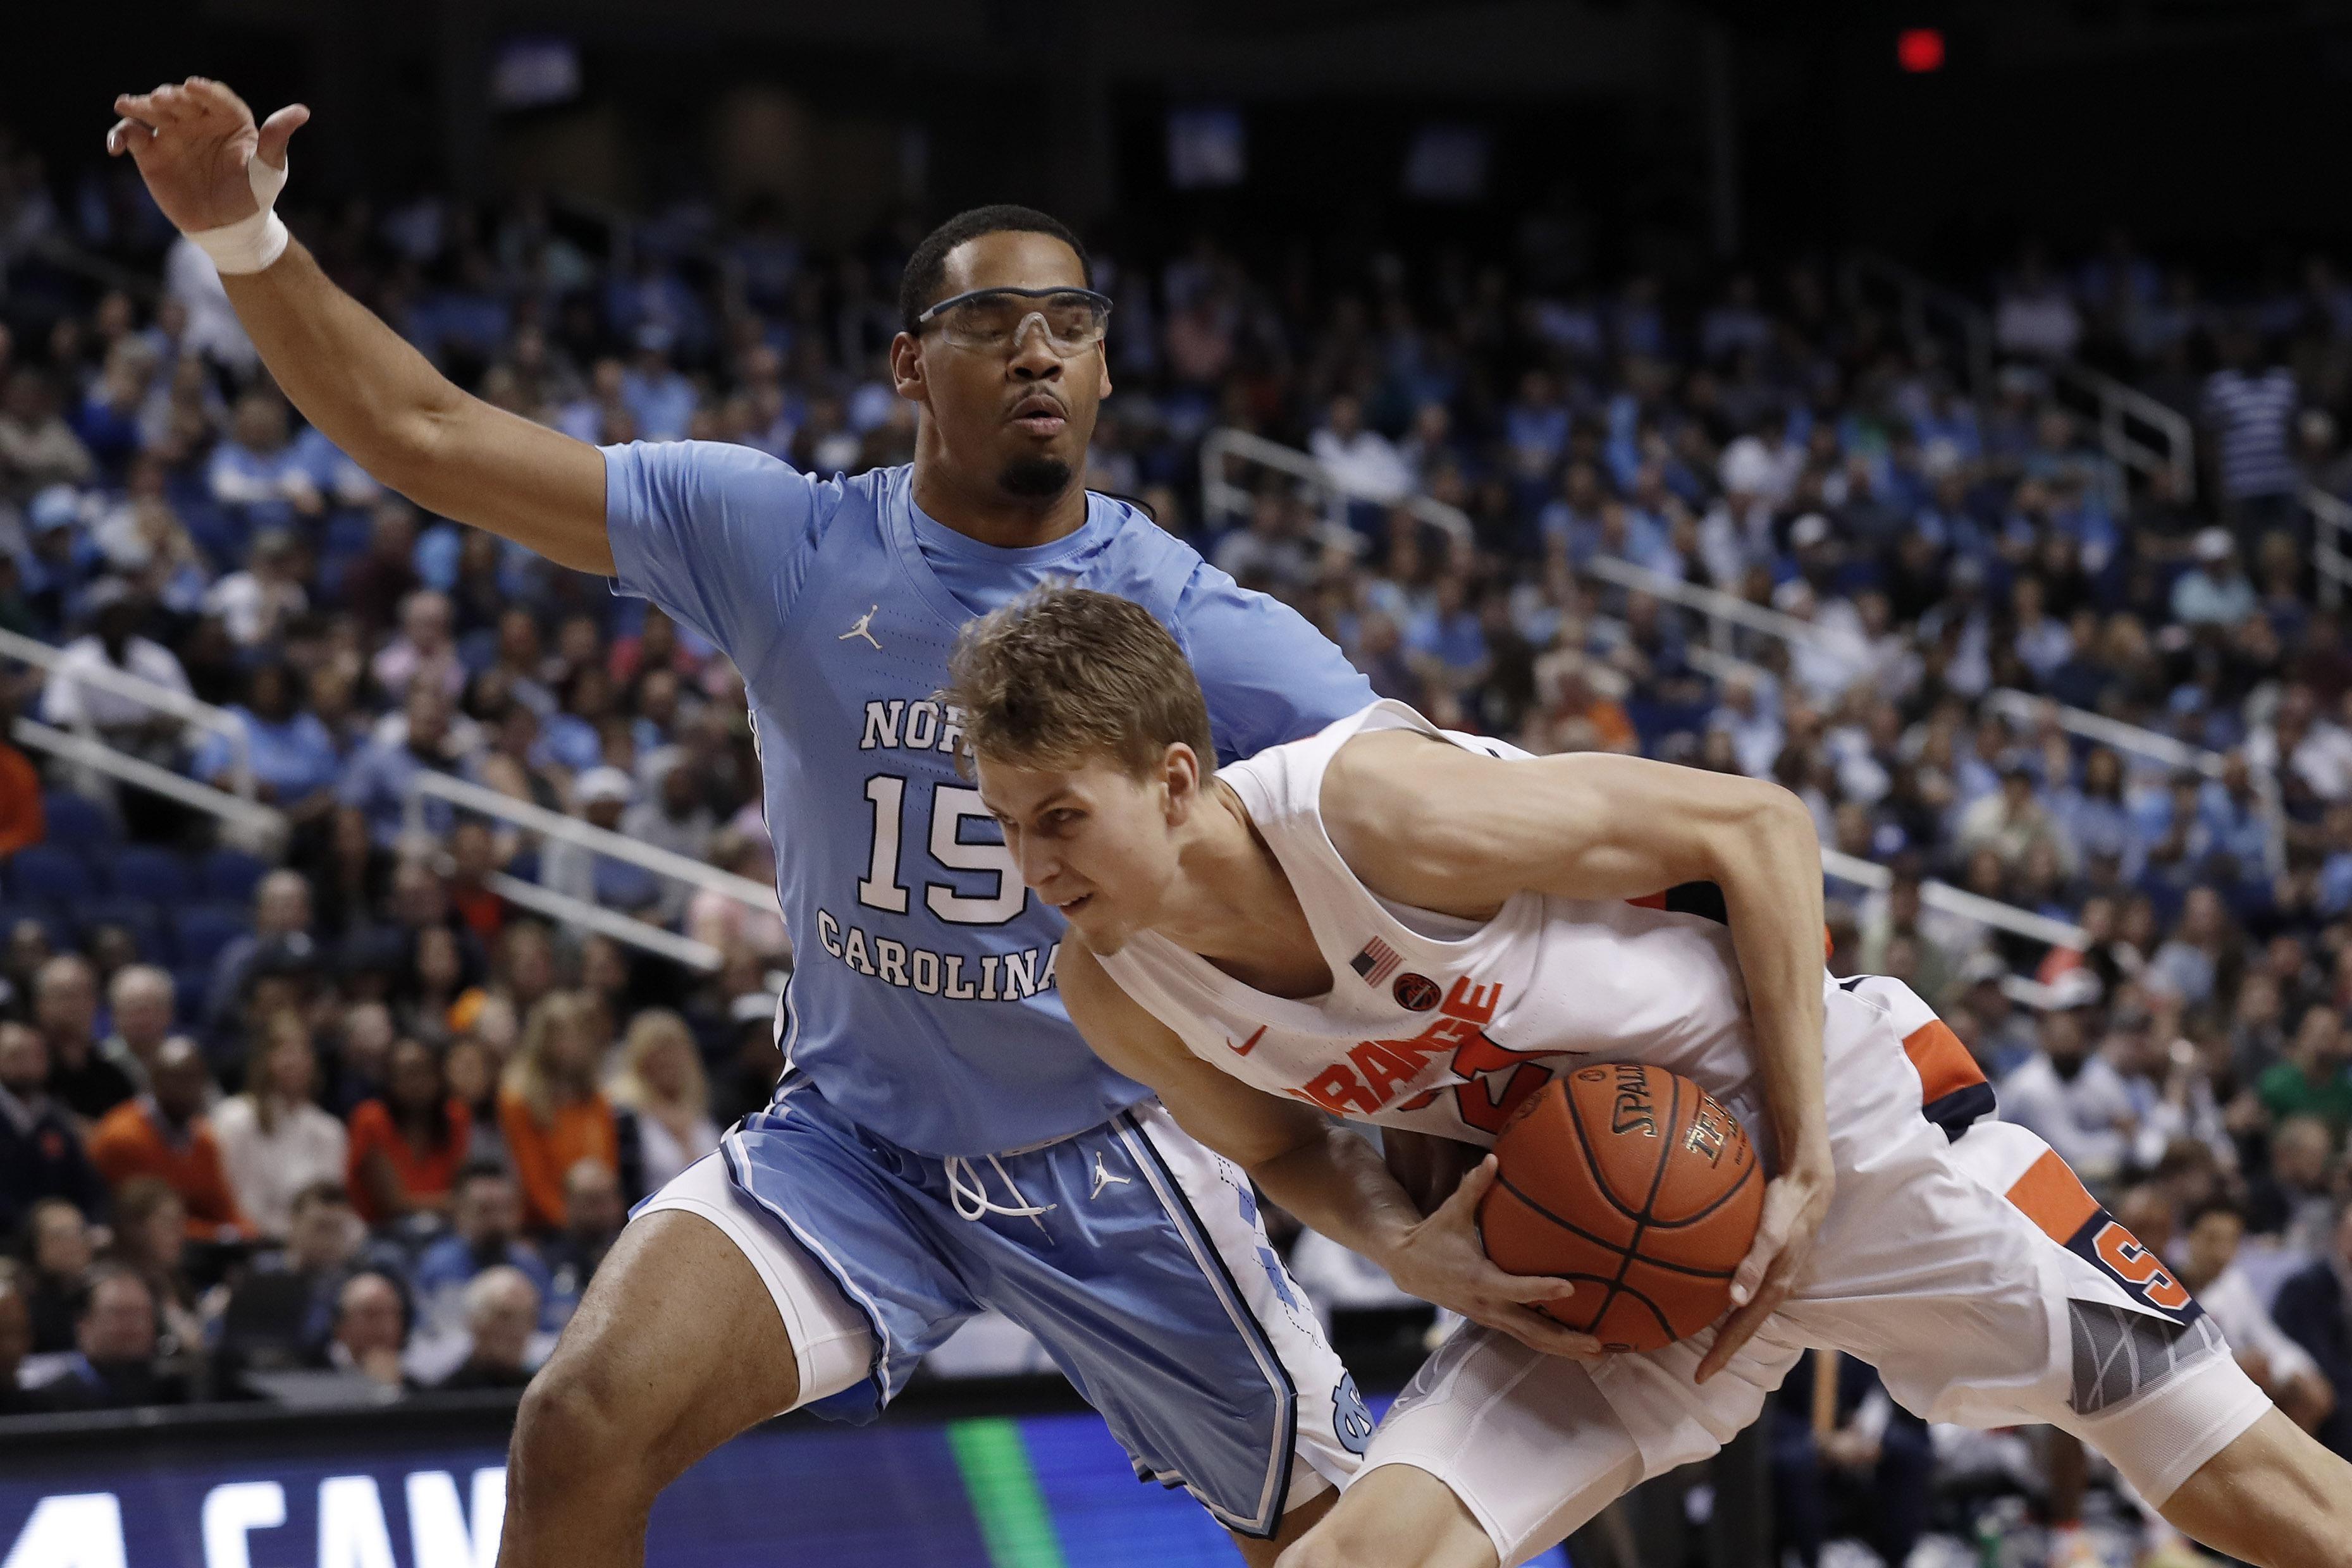 Atlantic Coast Conference moves men's basketball tournament from Washington, D.C. to North Carolina